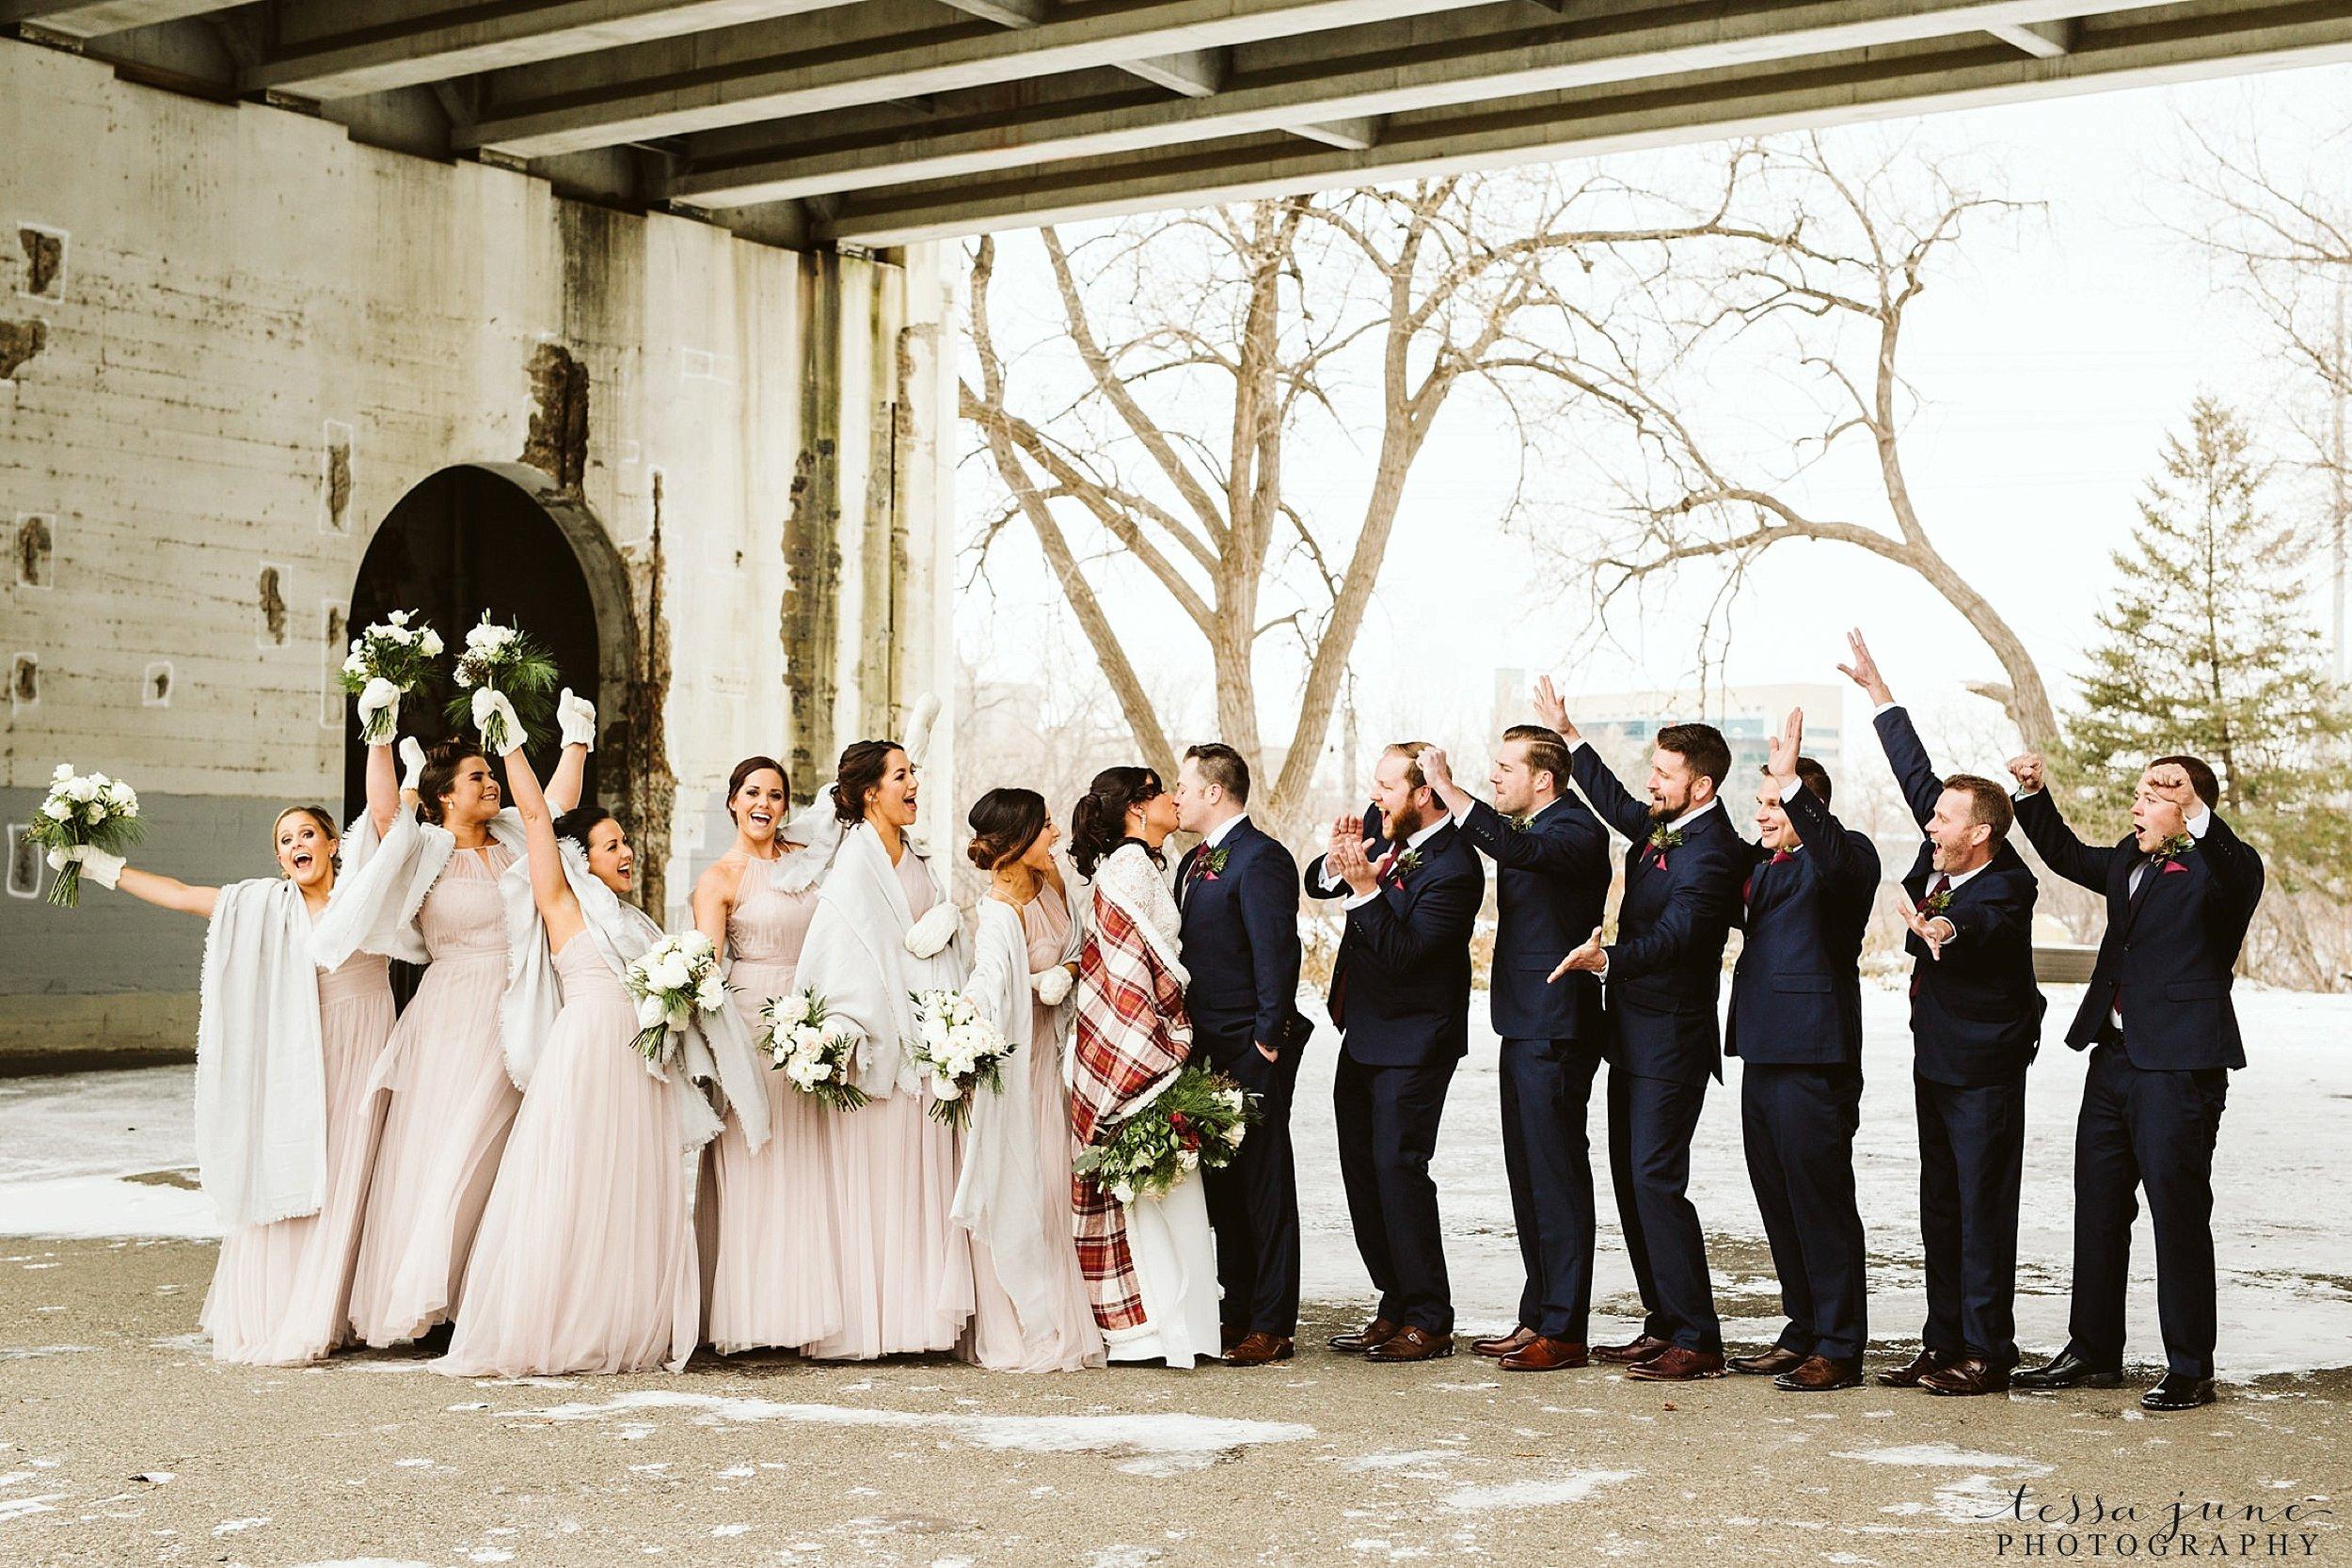 minneapolis-event-center-winter-romantic-snow-wedding-december-121.jpg